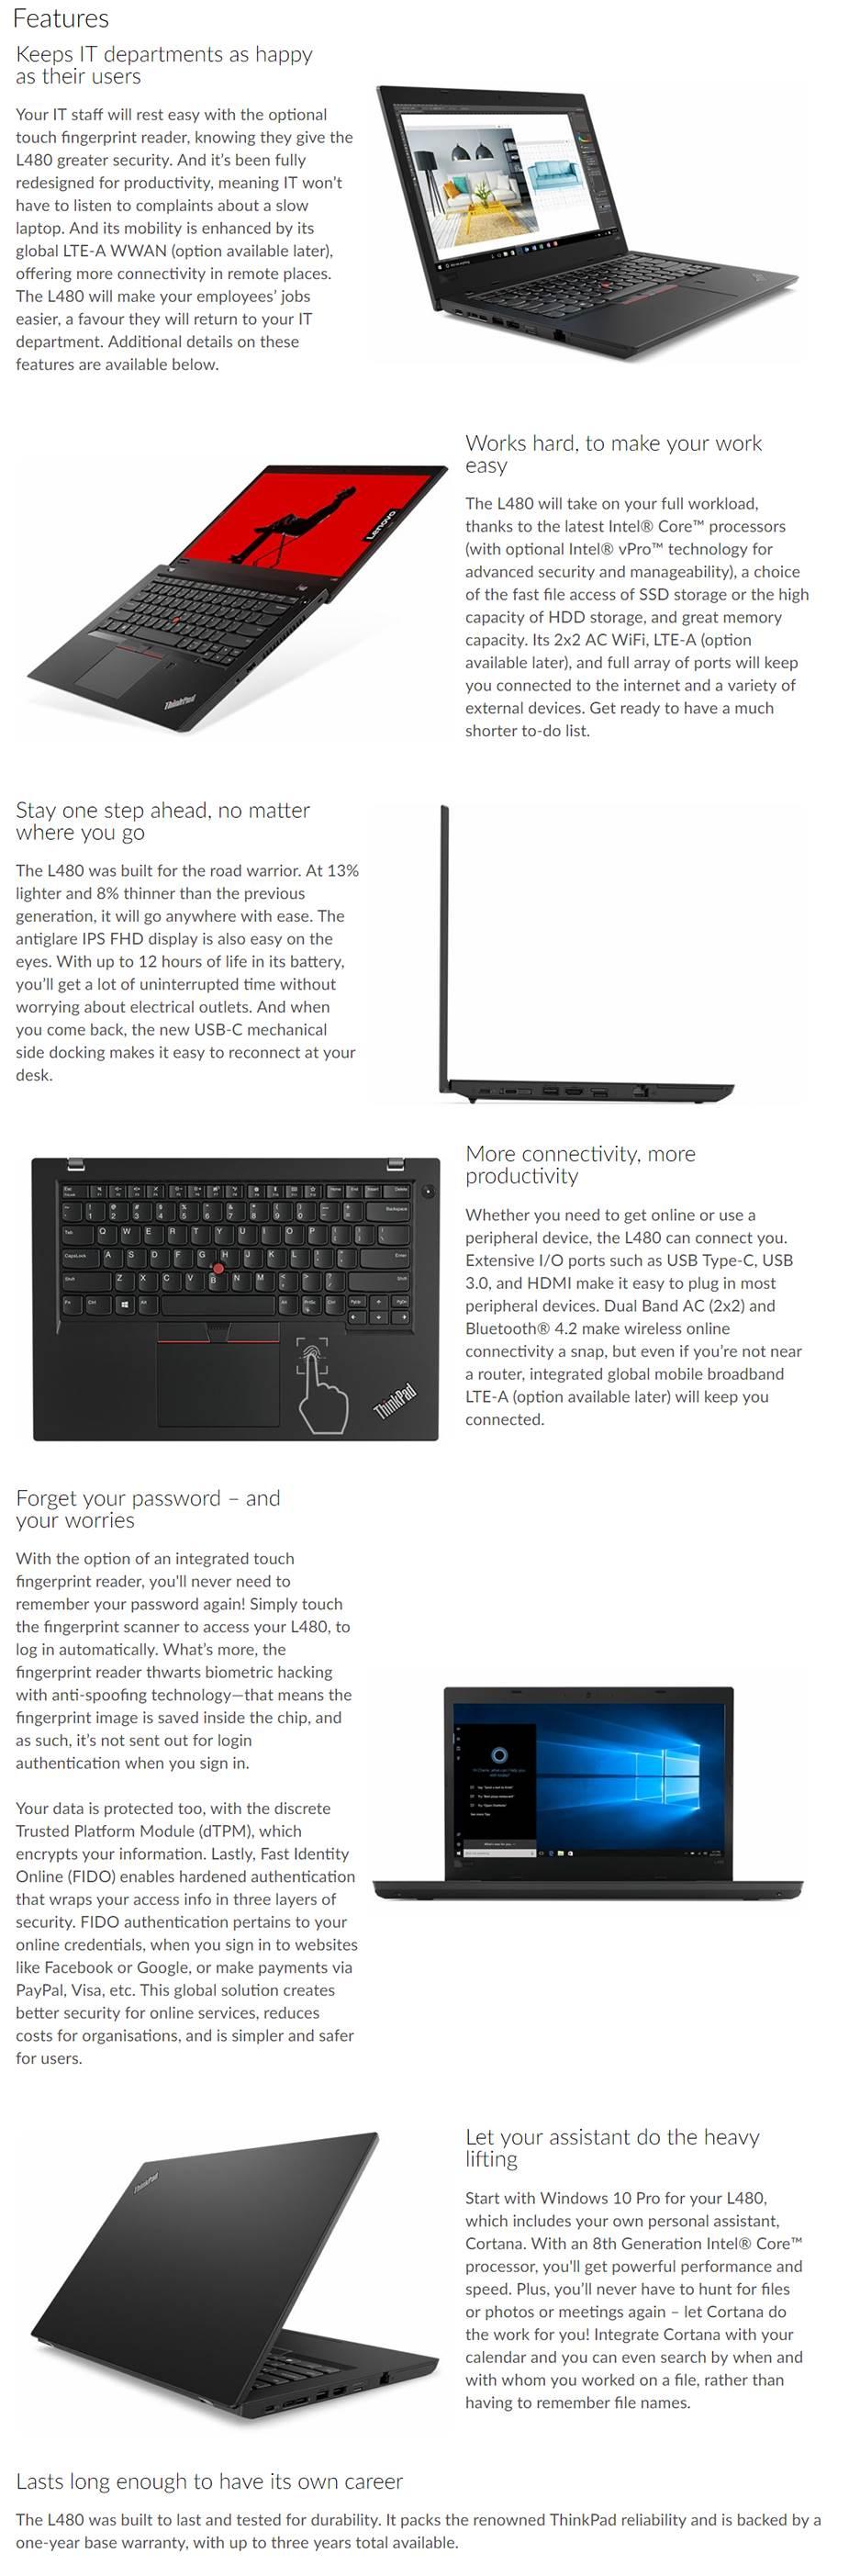 Lenovo Thinkpad L480 14In FHD I7-8550U 8Gb Ram 256Gb SSD Win10 Pro 3 Cell  1Yrdp